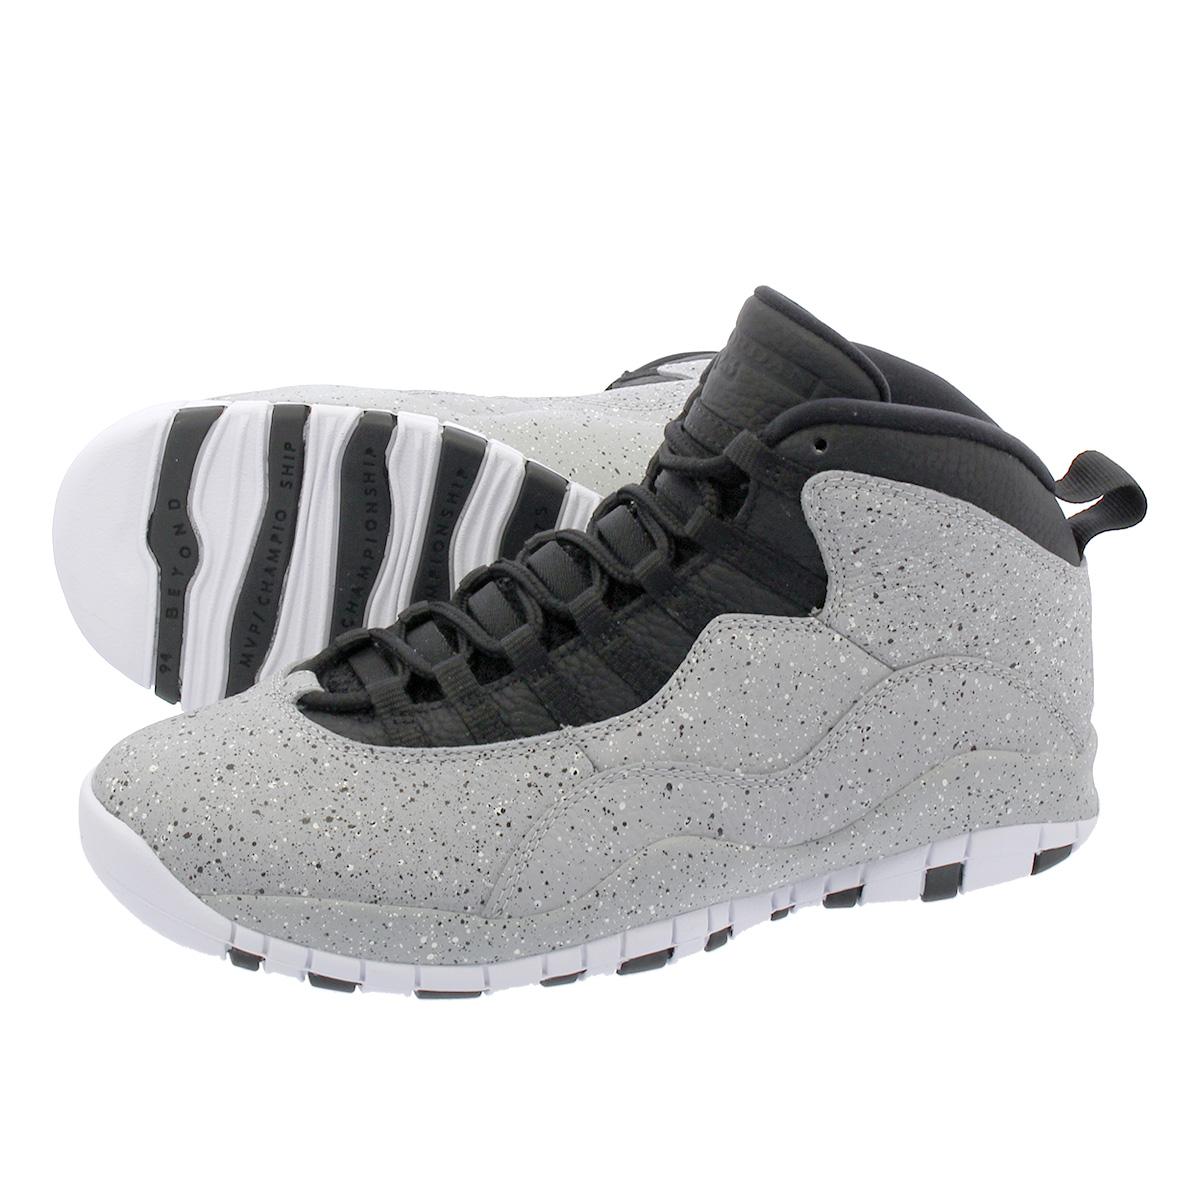 5c30373a343 LOWTEX PLUS: NIKE AIR JORDAN 10 RETRO Nike Air Jordan 10 nostalgic COOL  GREY/COOL GREY/WHITE 310,805-062   Rakuten Global Market